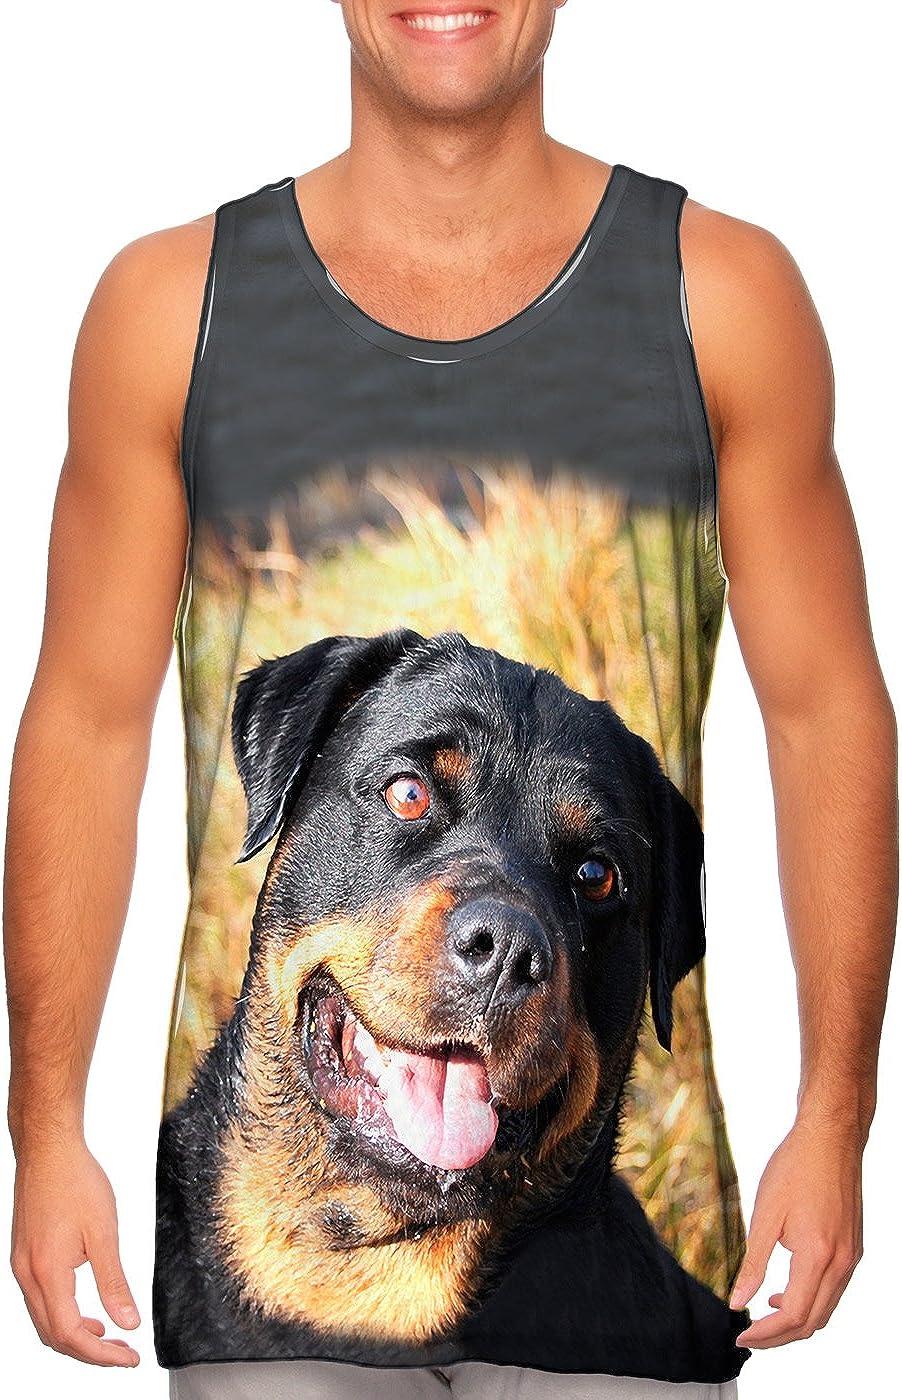 Yizzam Ranking integrated 1st place Detroit Mall AnimalShirtsUSA- Bashful Rottweiler Mens To Tank -Tshirt-